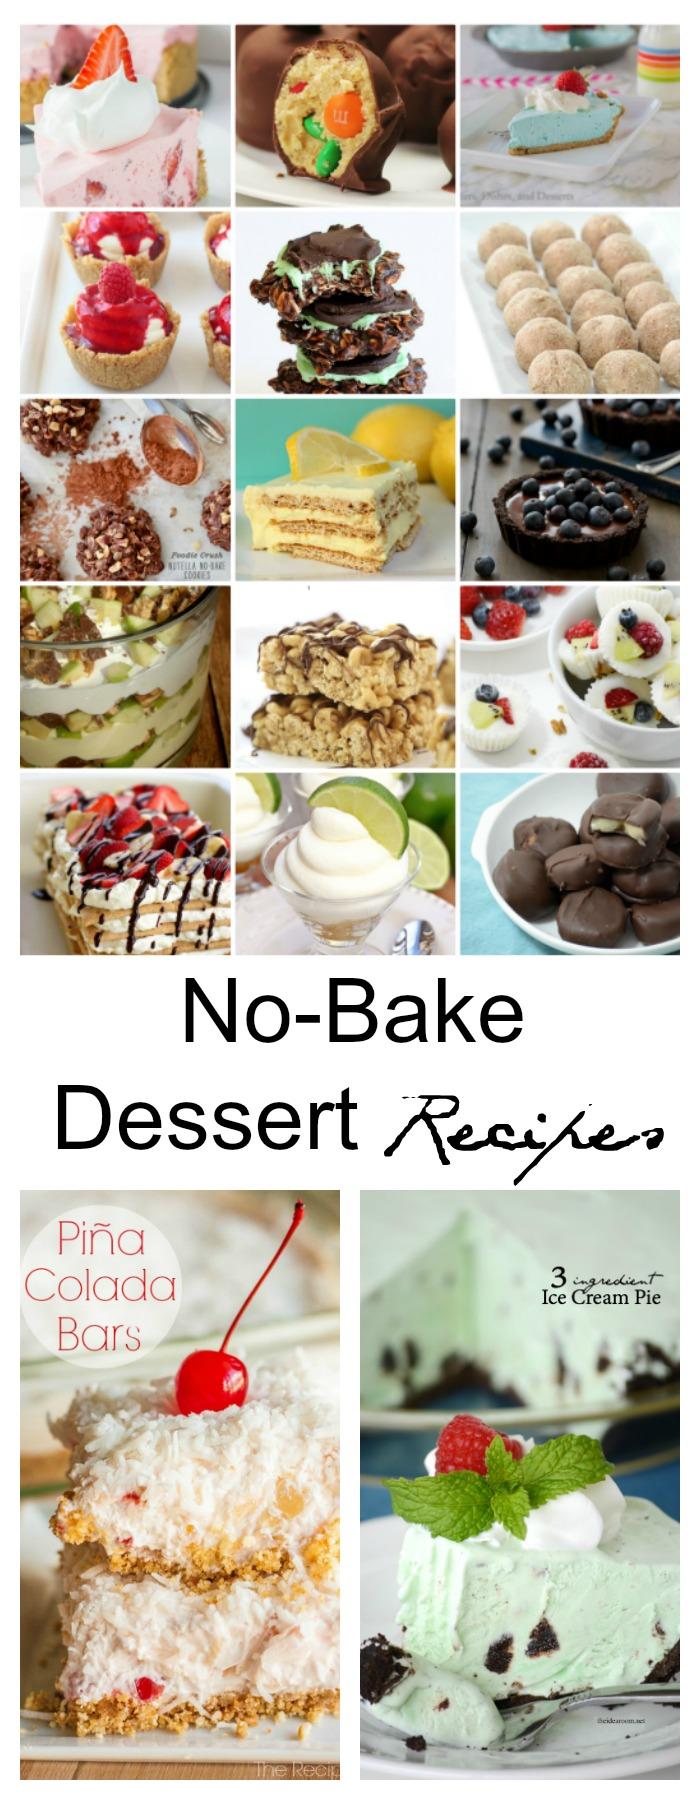 No-Bake-Dessert-Recipes-Pin